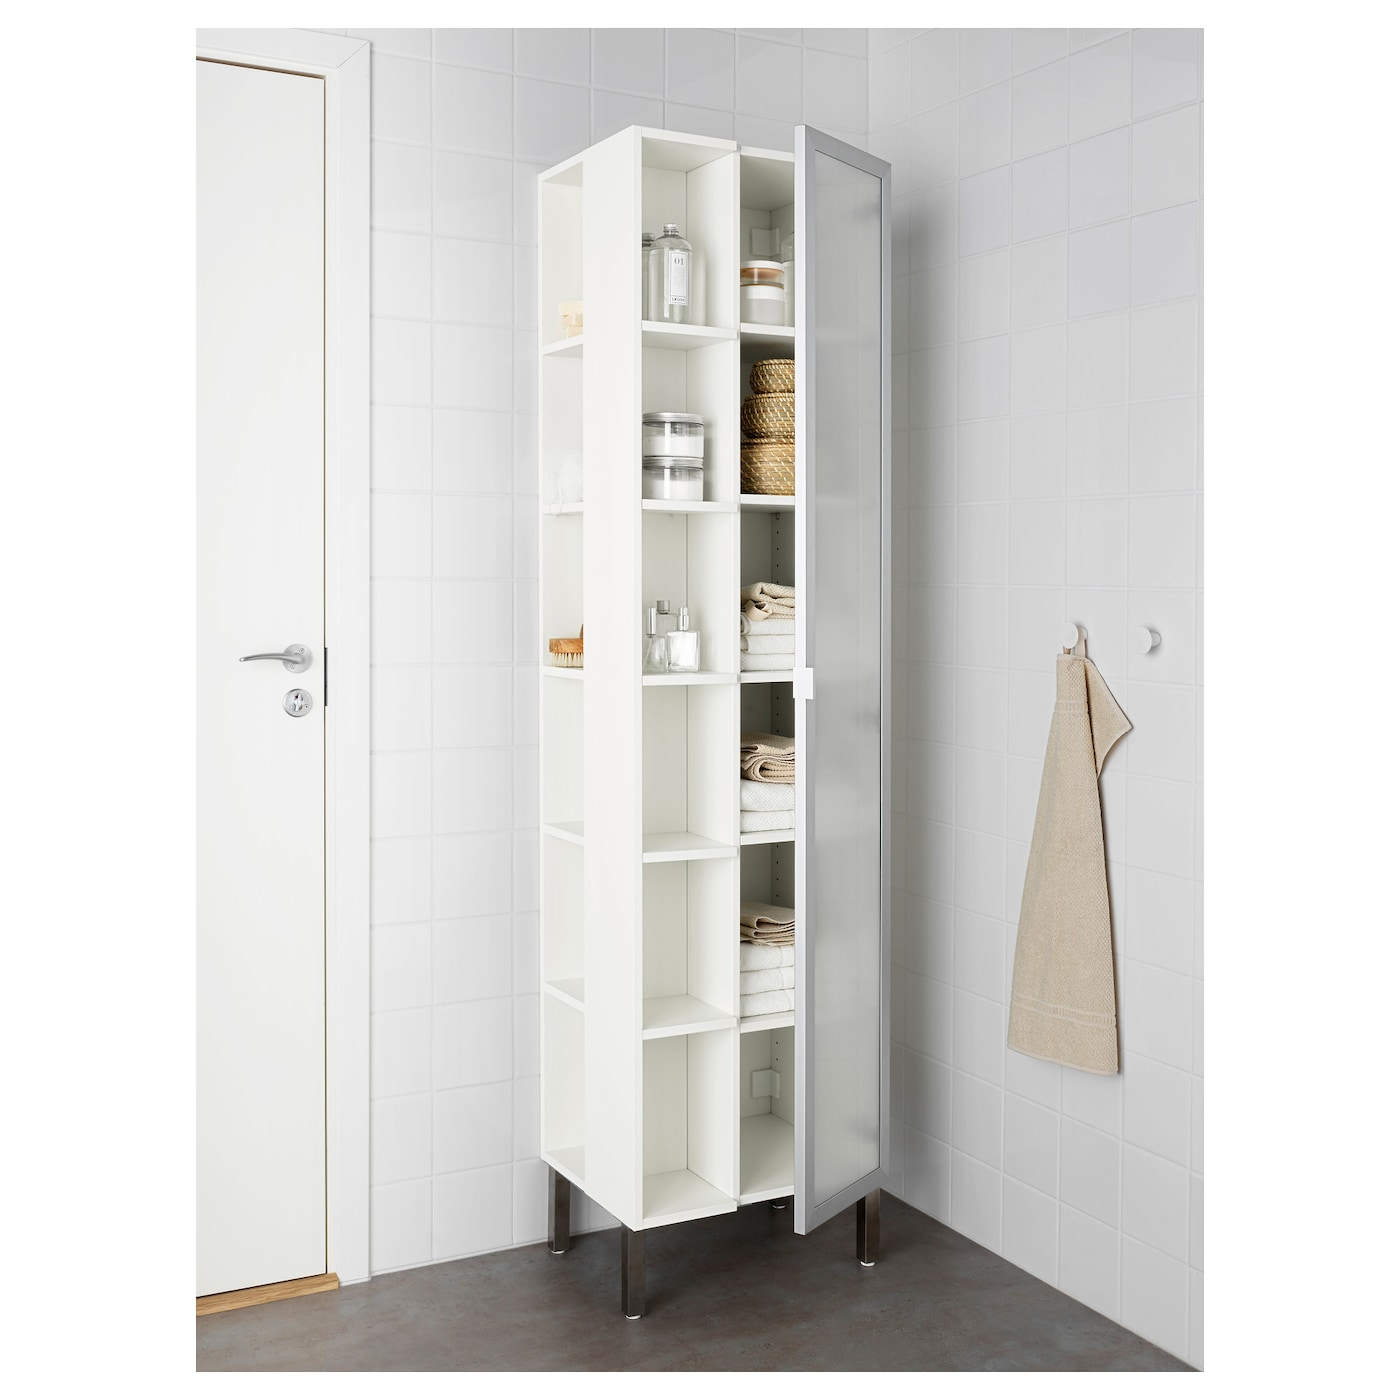 Ikea LillÅngen End Unit A Good Solution If You Are Short Of E